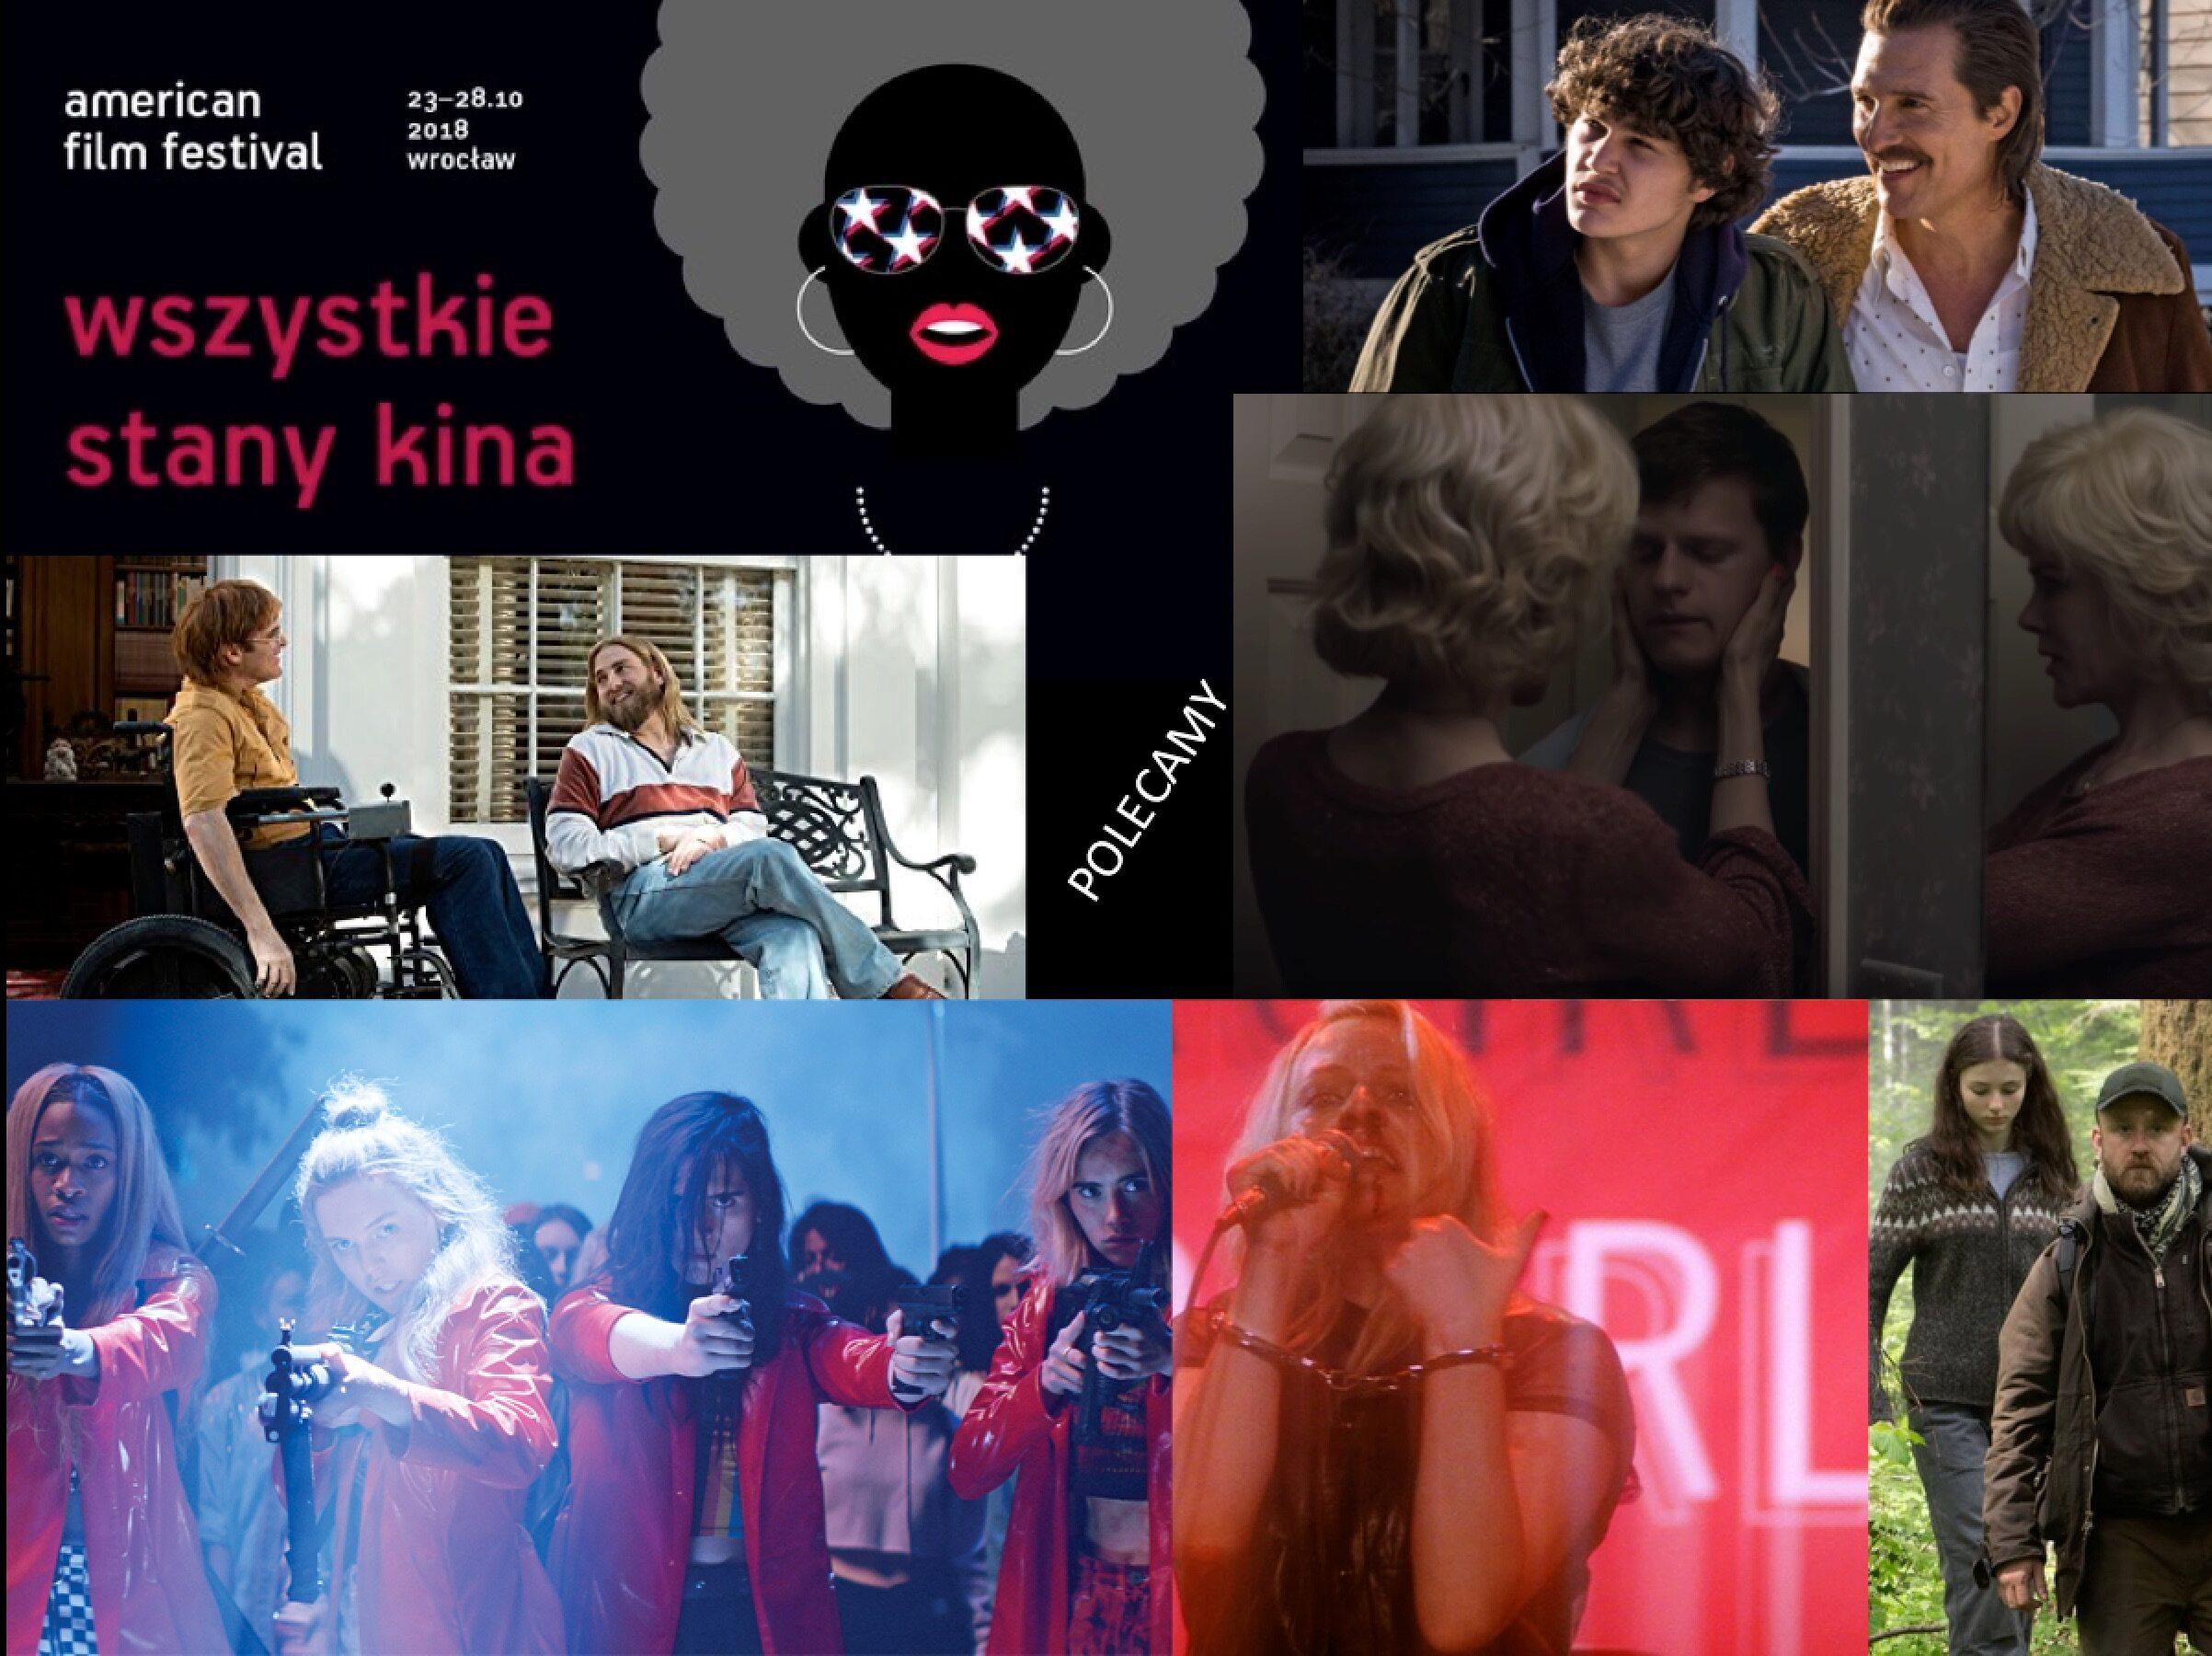 American Film Festival 2018